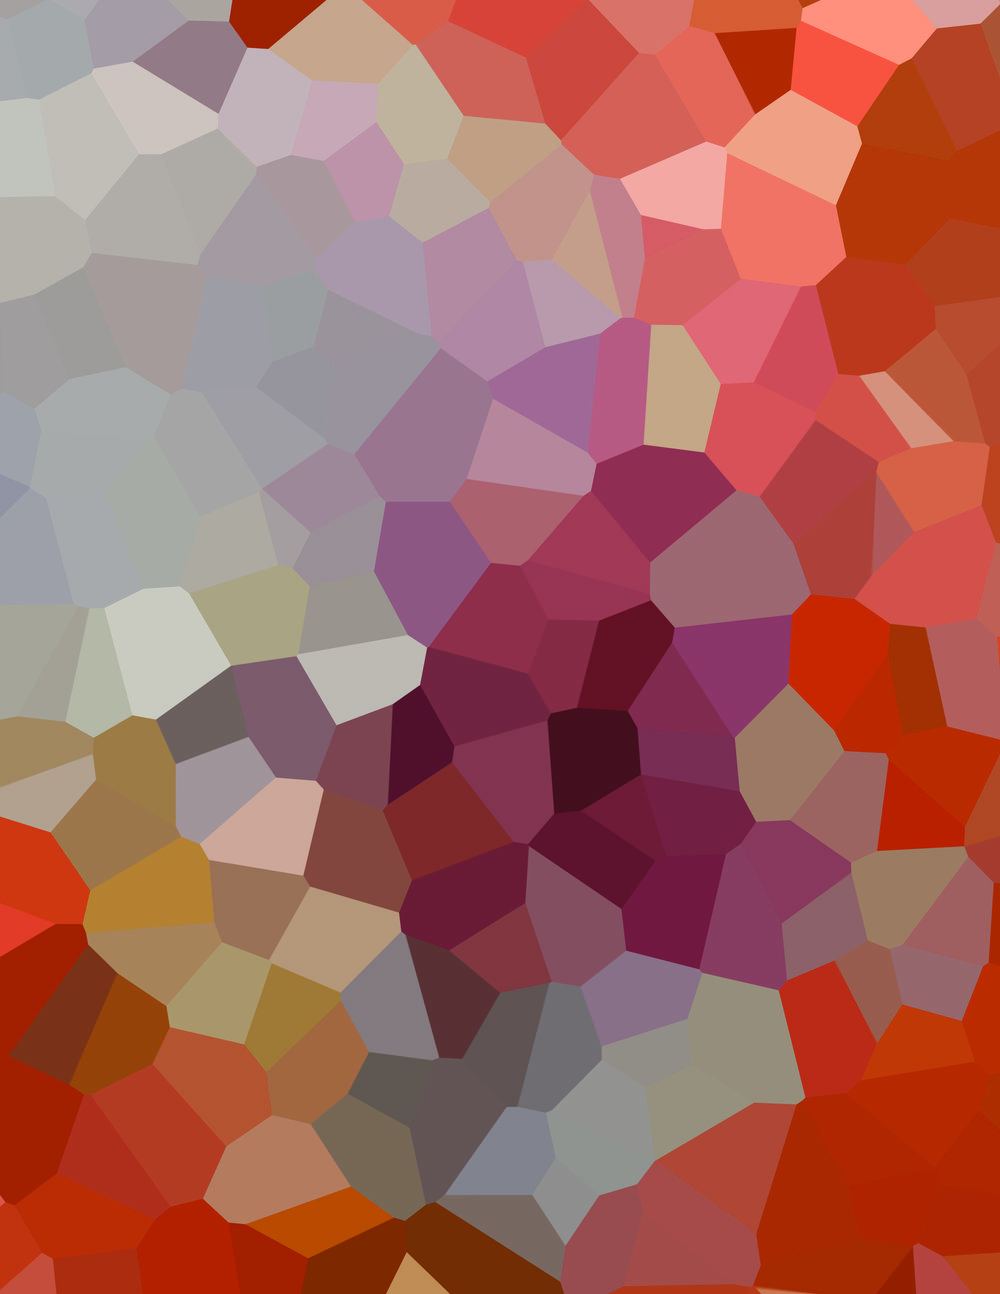 rock_6_mosaic.jpg